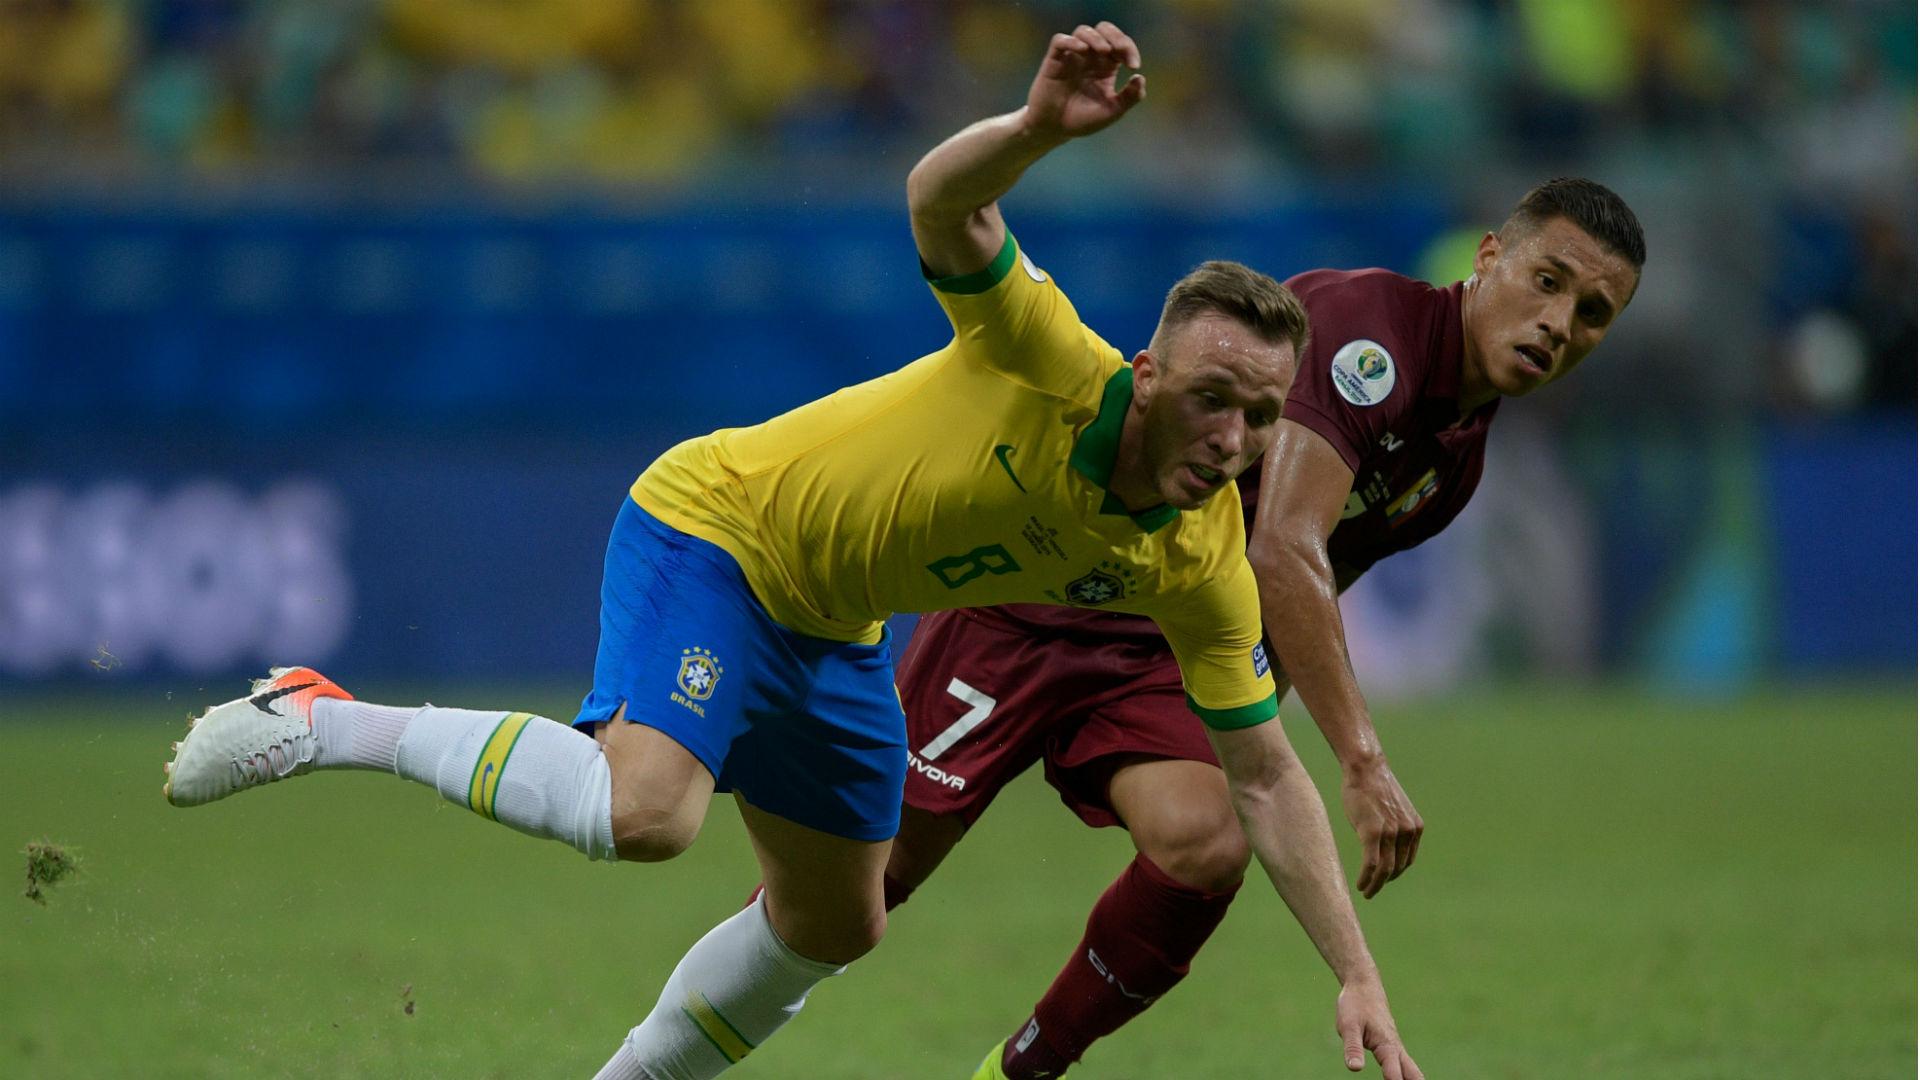 Arthur Darwin Machis Brazil Venezuela Copa America 2019